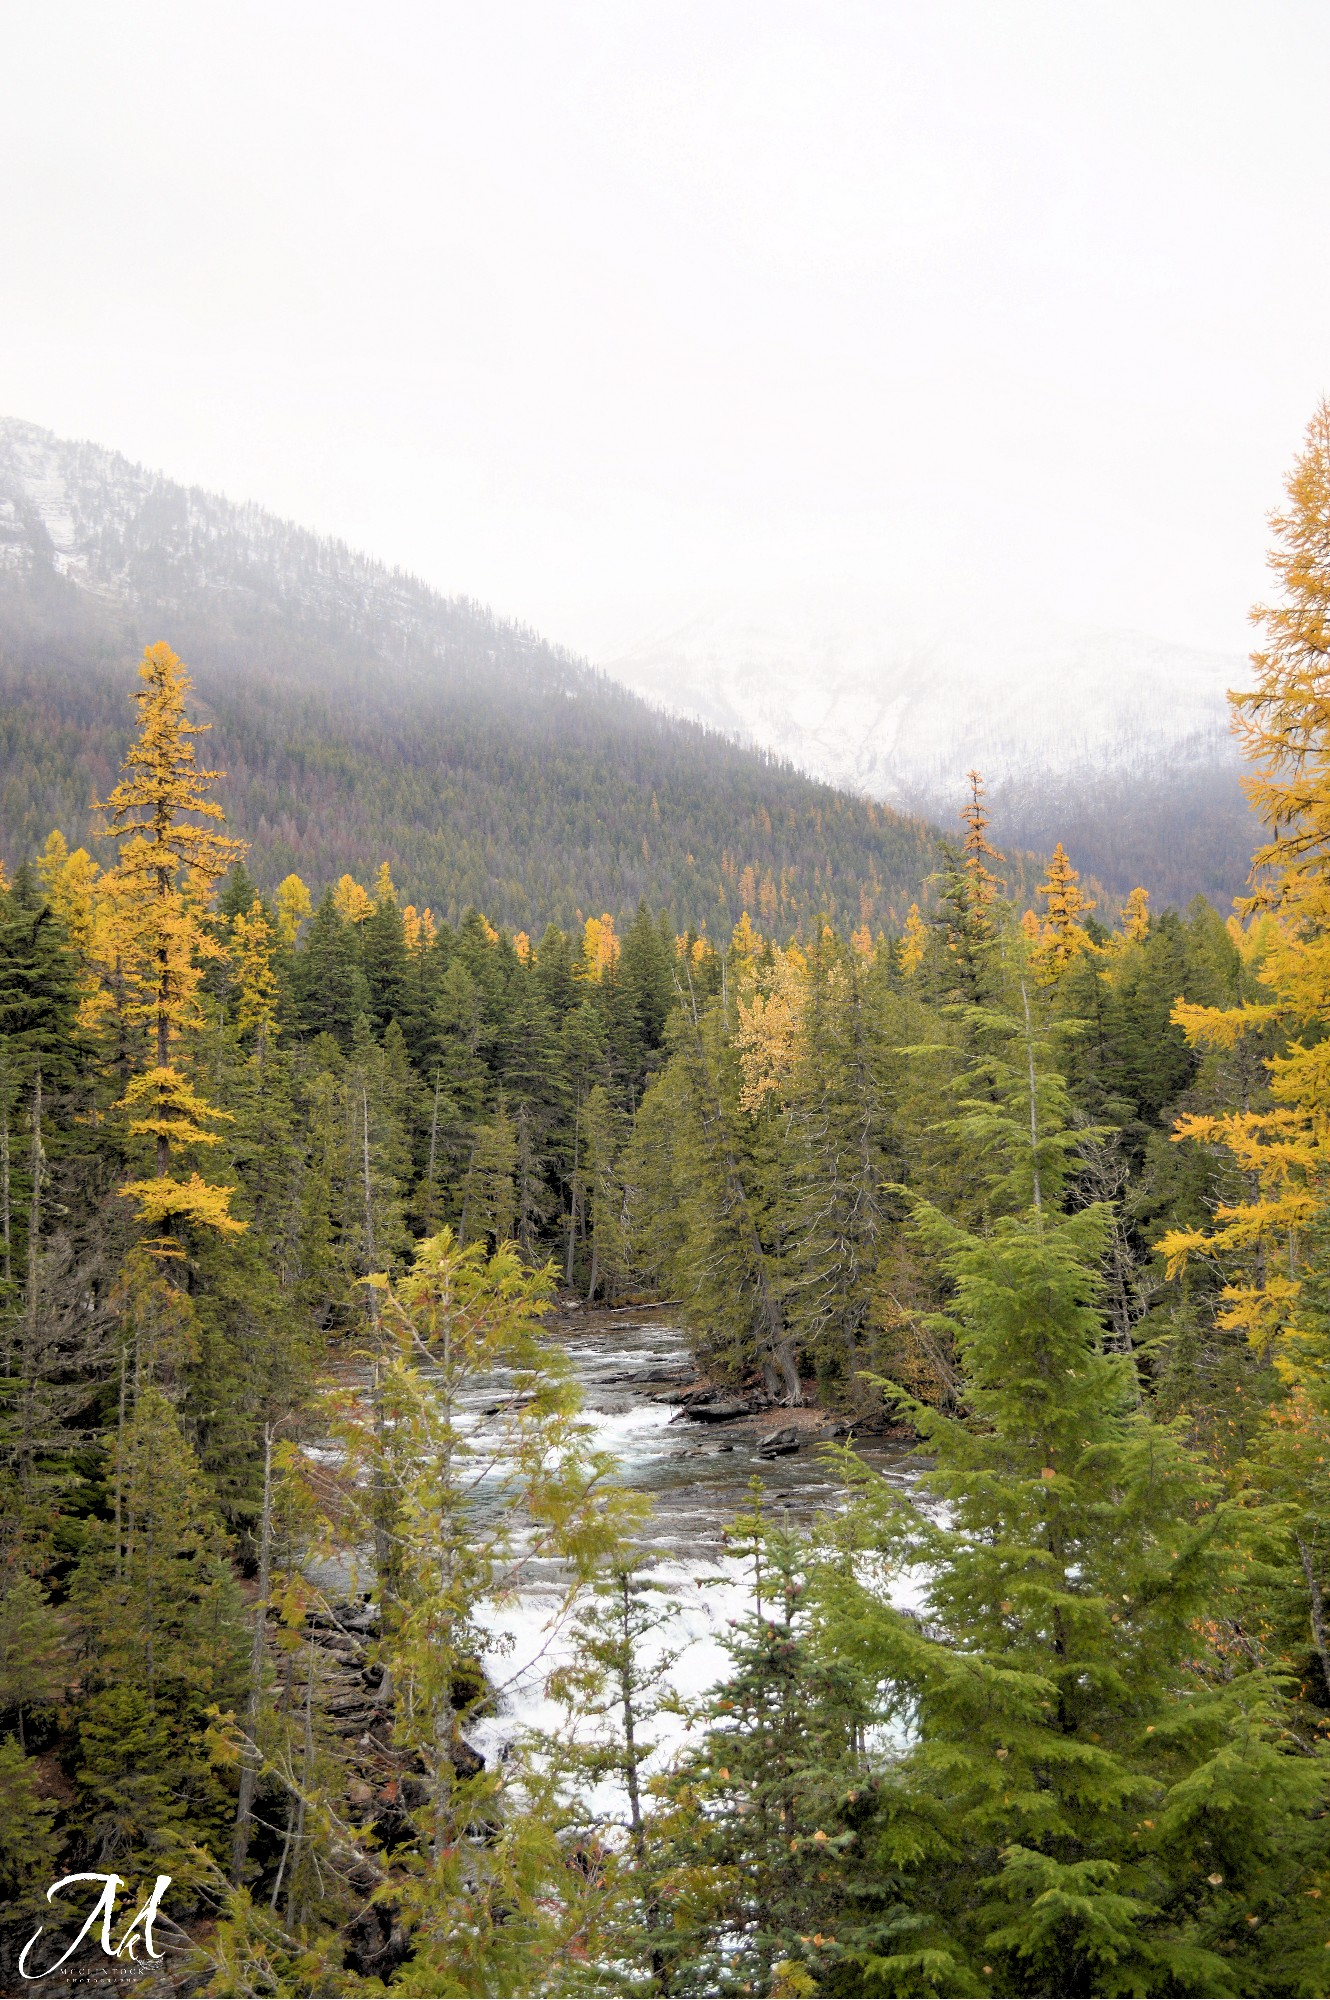 October Rain in Glacier National Park_MKMcClintock | #photography #GlacierPark #river #waterfall #autumn